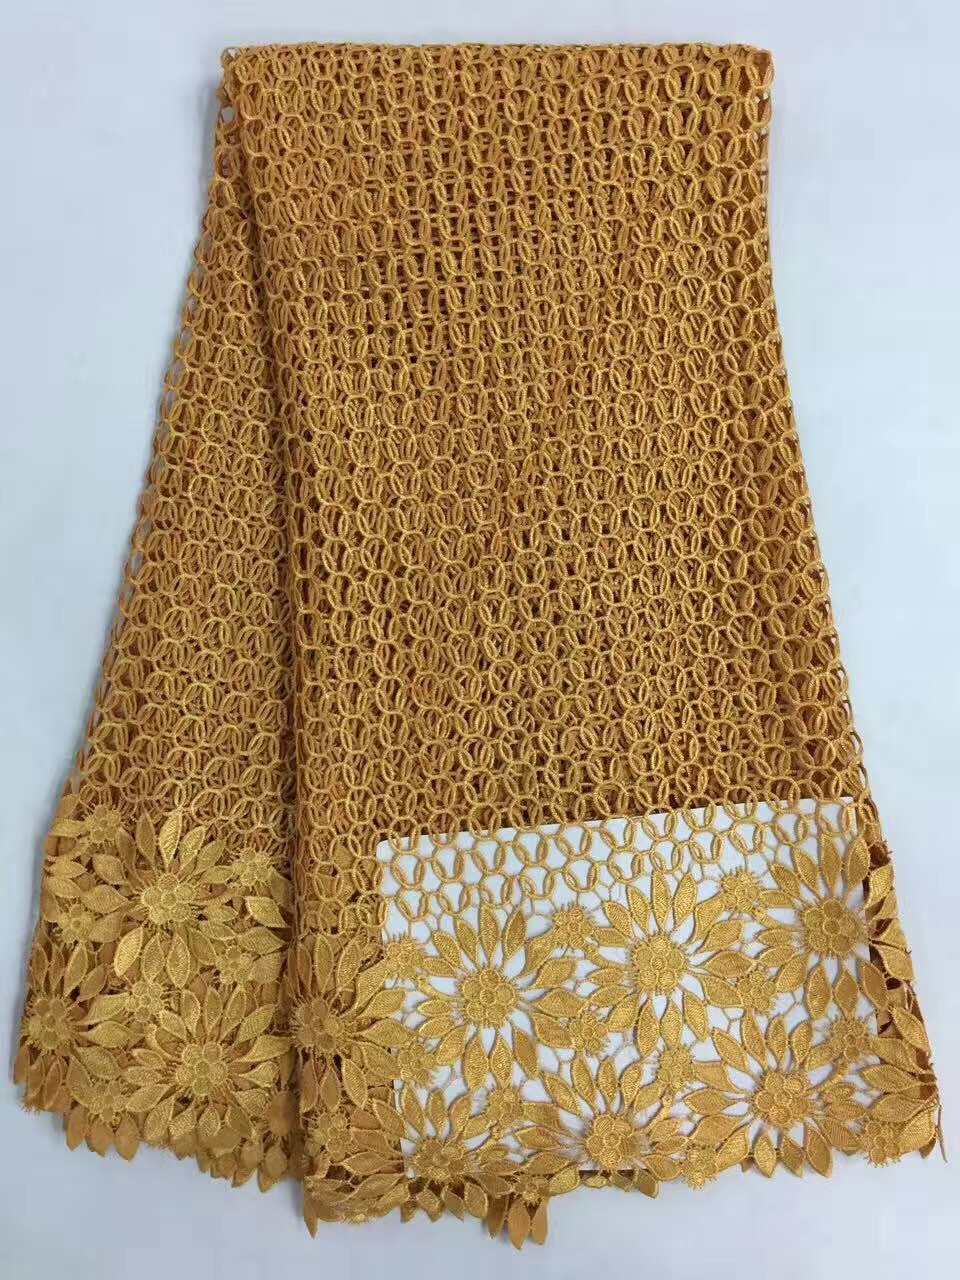 RL110801 핫 아프리카 폴리 에스테르 나이지리아 guipure 코드 레이스, 고품질 수용성 레이스 직물 웨딩 드레스 5y / lot